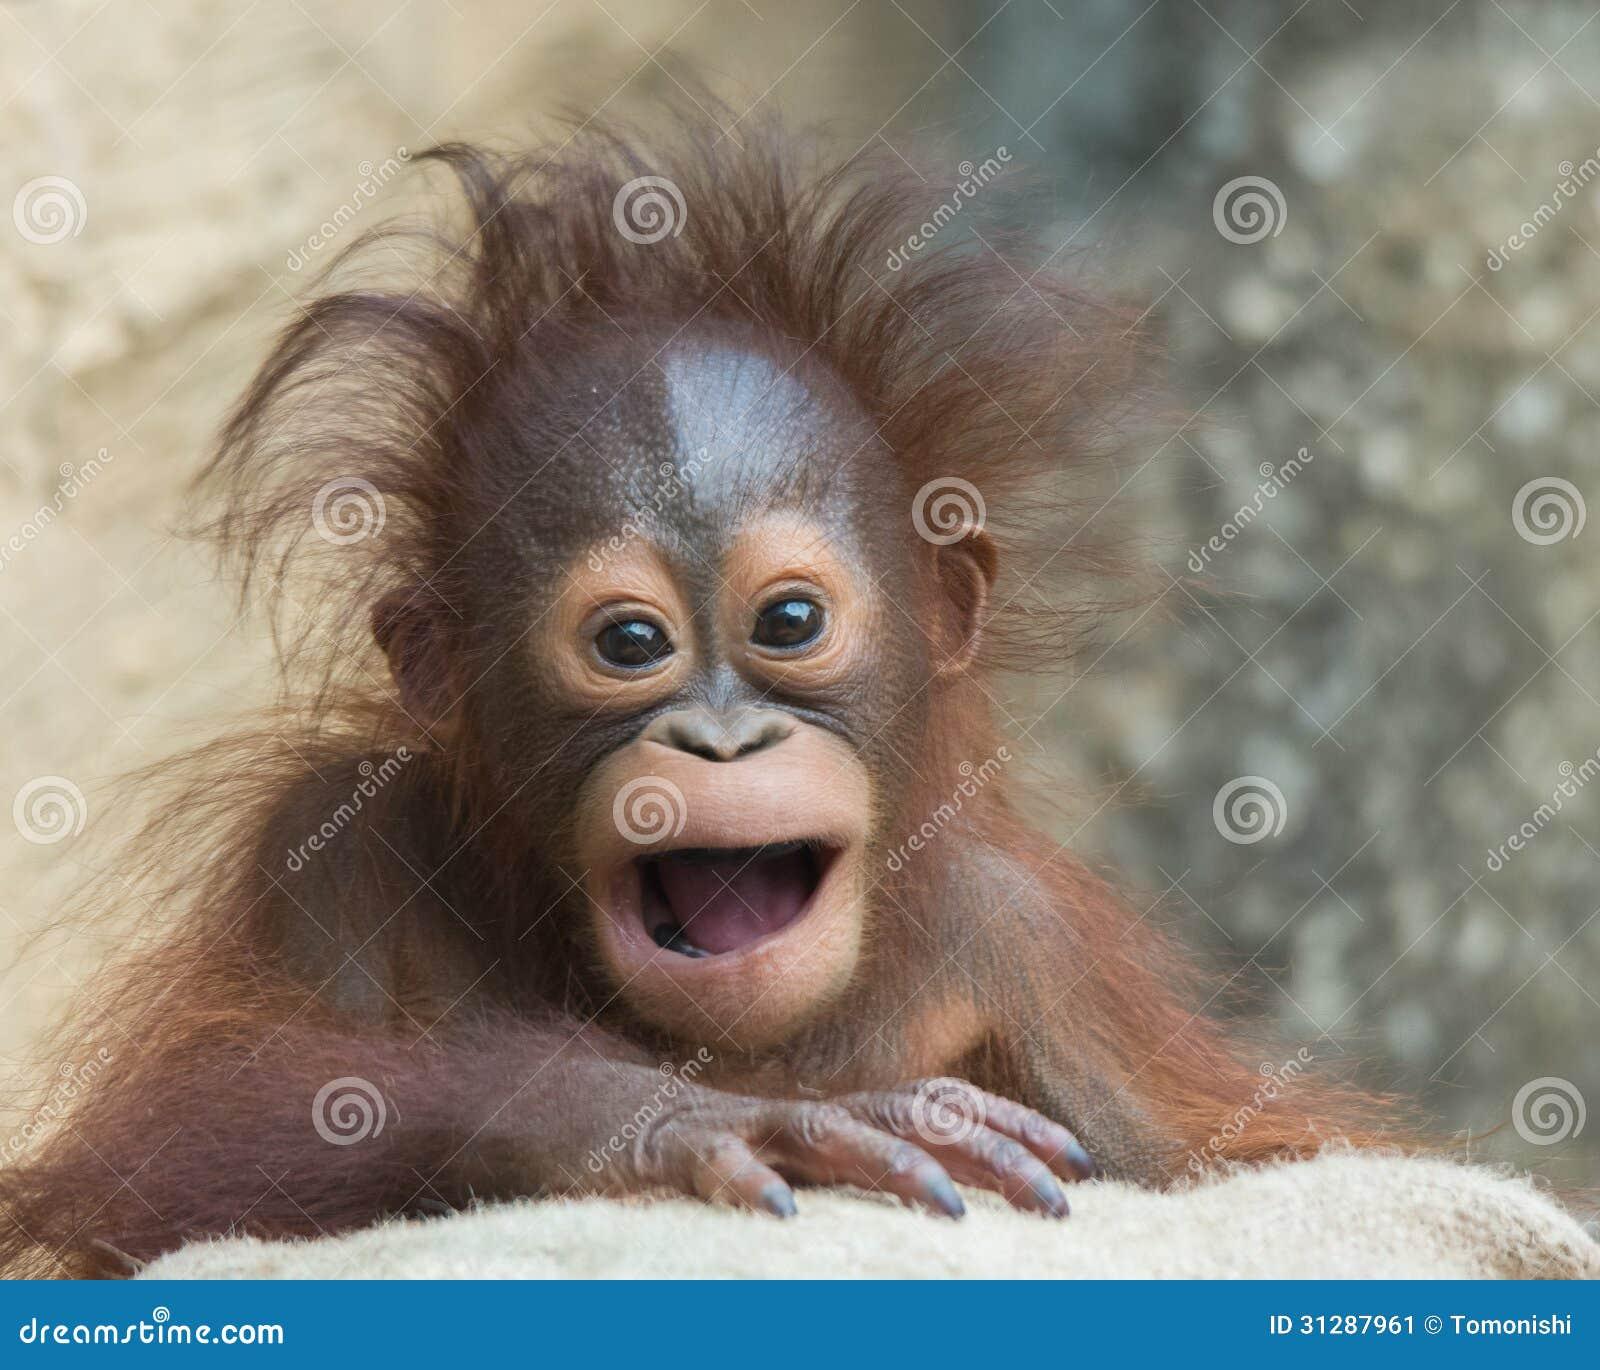 Smiling baby orangutan - photo#9